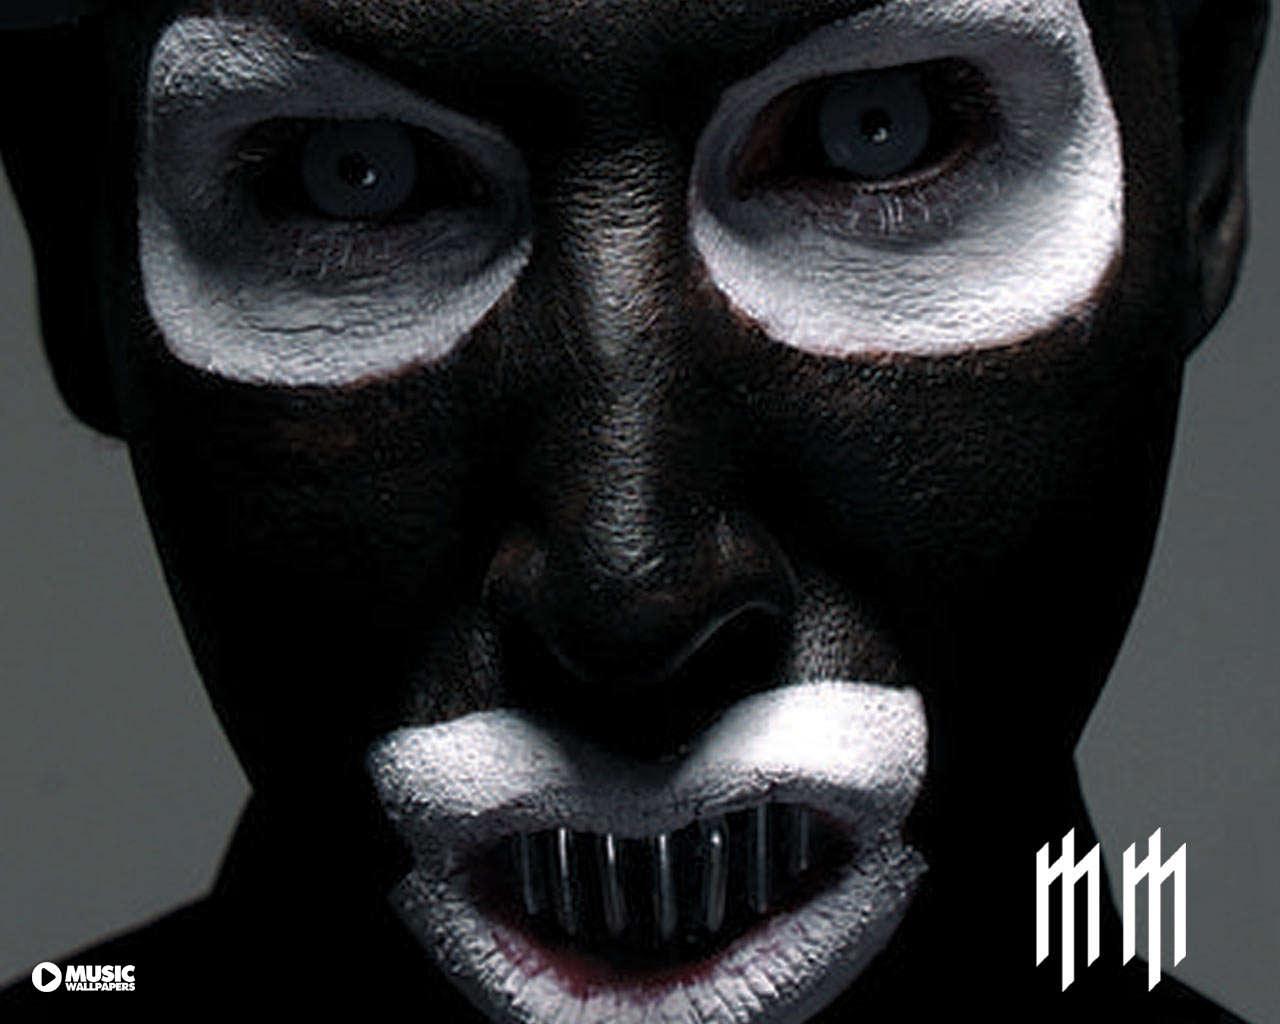 Marilyn Manson Wallpaper Marilyn Manson Golden Age Of Grotesque